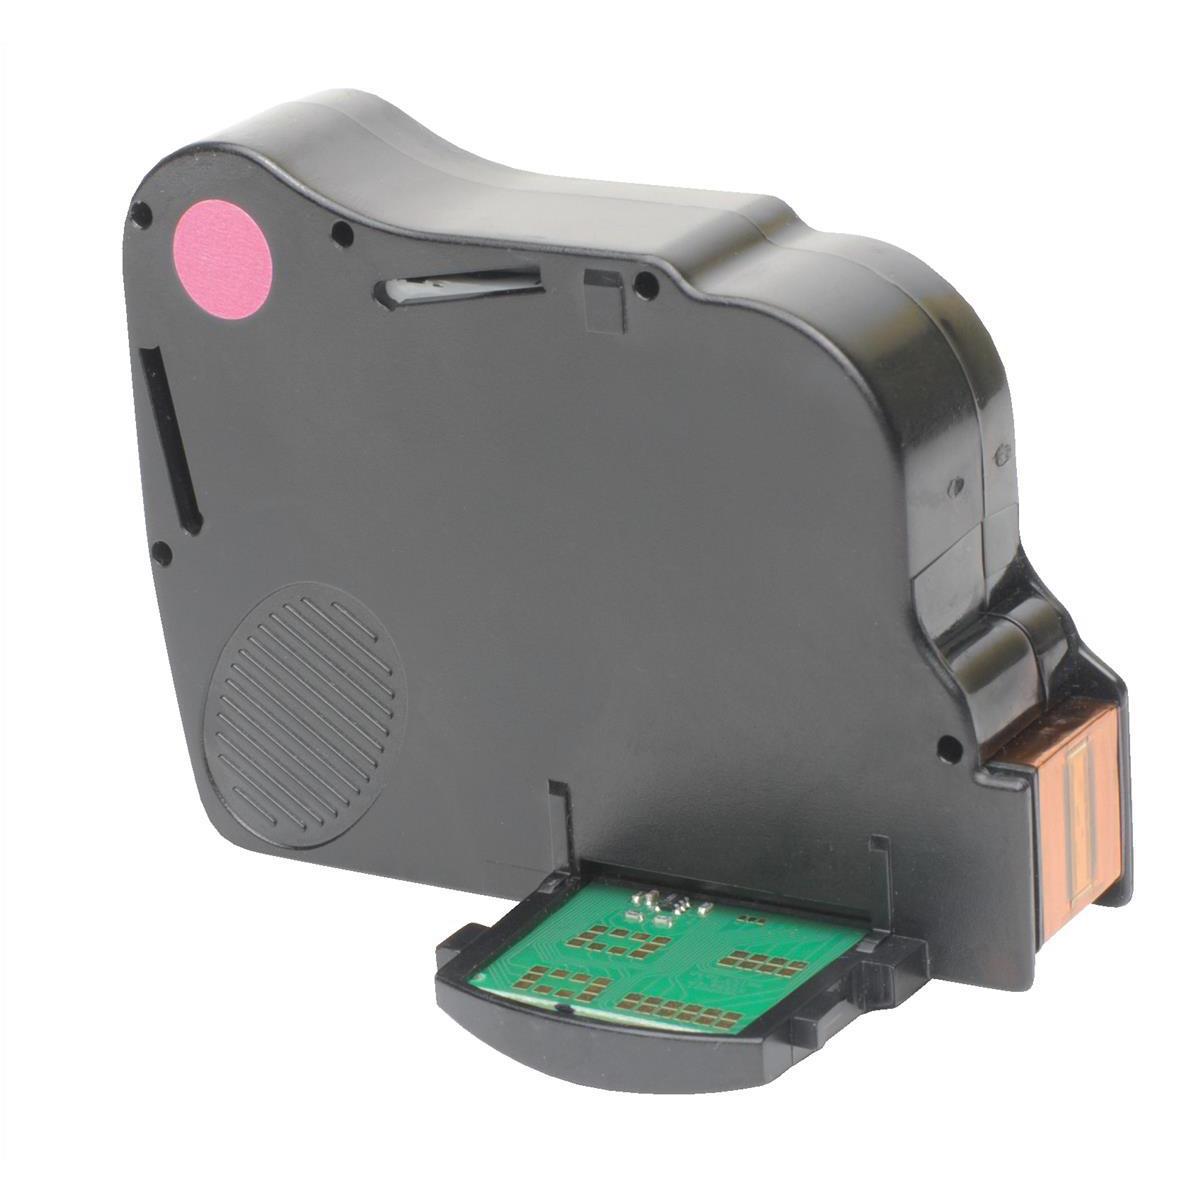 Image for Totalpost Franking Inkjet Cartridge Red [Neopost 300206 Equivalent] Ref 10178-800